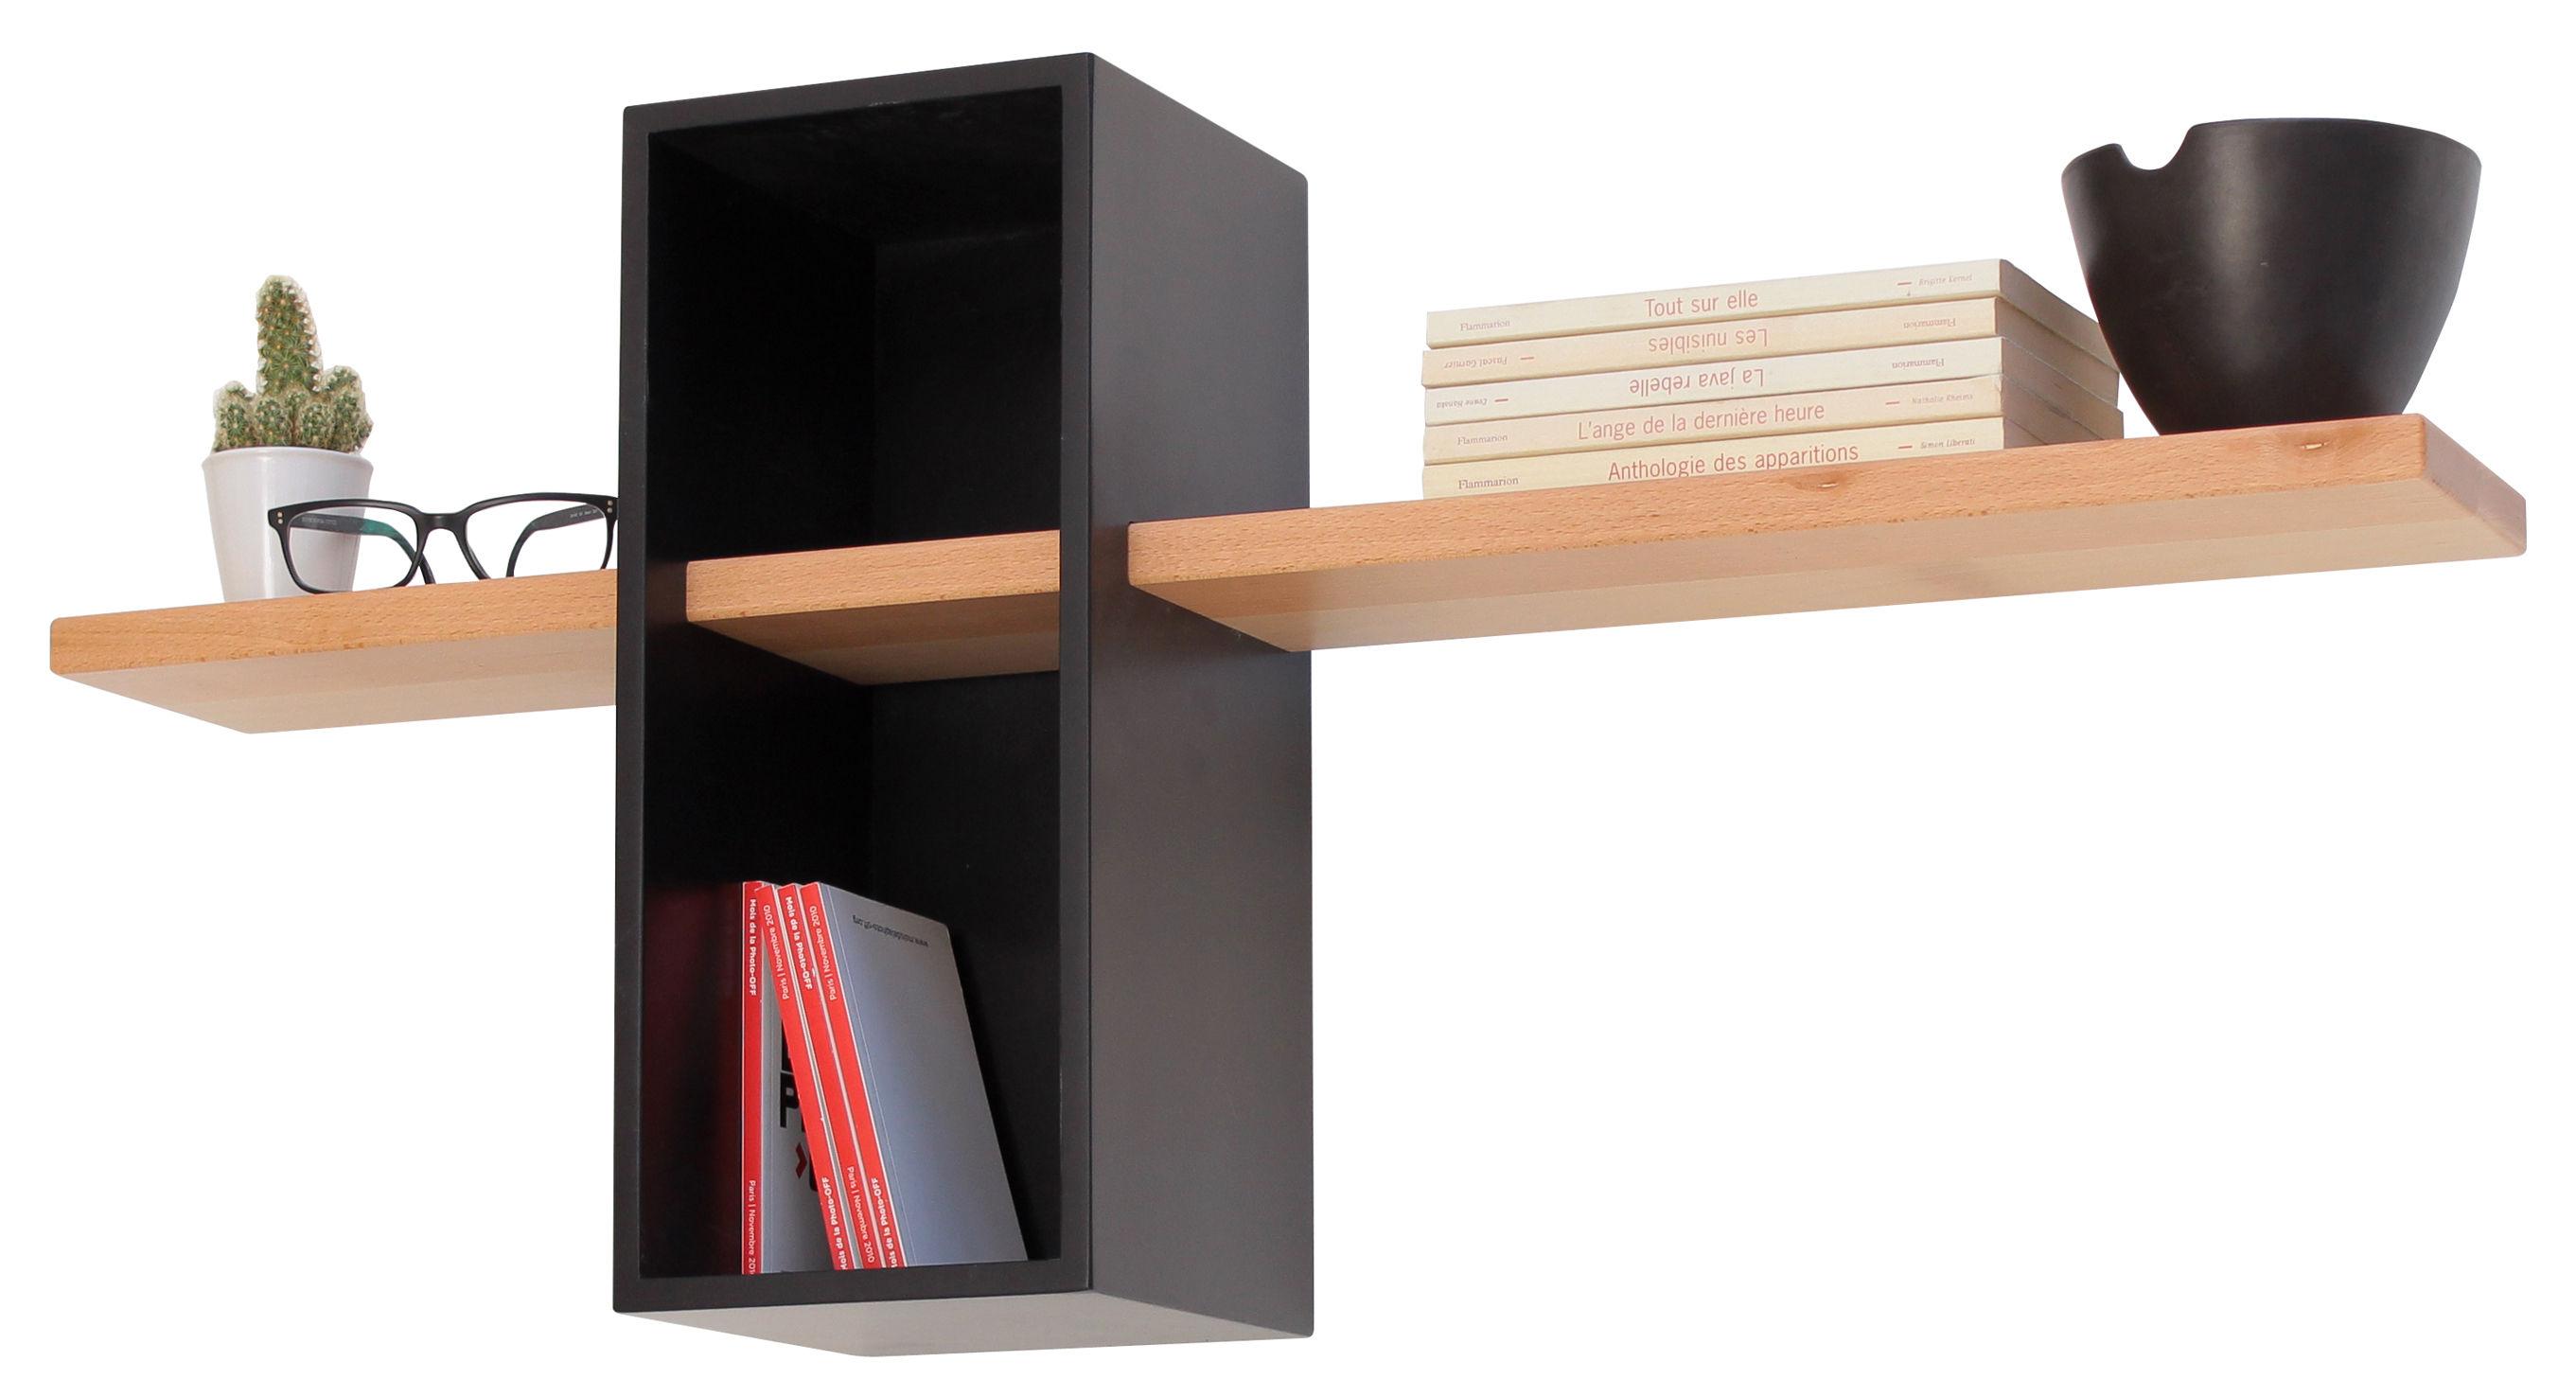 etag re max simple 1 caisson 1 tag re noir compagnie. Black Bedroom Furniture Sets. Home Design Ideas